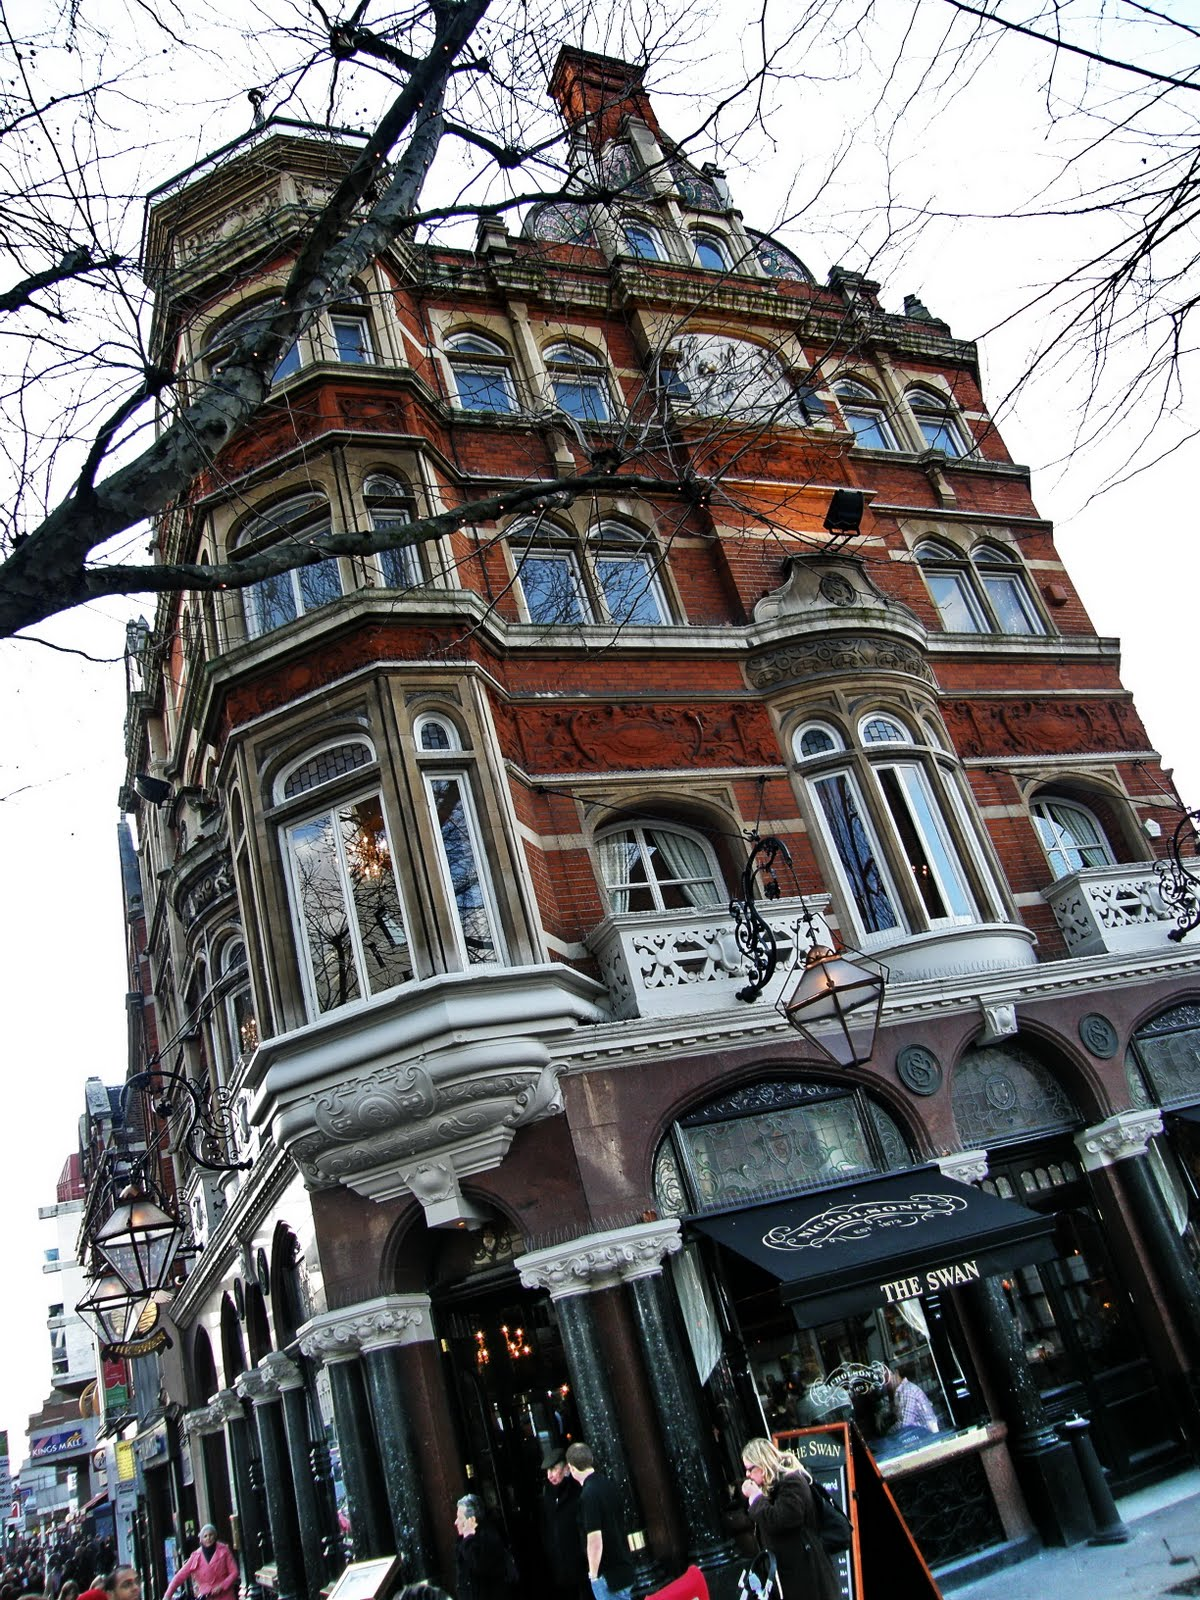 http://4.bp.blogspot.com/_F0vuiMDsa3k/TJSrAaZUGnI/AAAAAAAAAJw/gkp9cnztlyU/s1600/13+Hammersmith+Broadway,+Hammersmith,+London+3.jpg